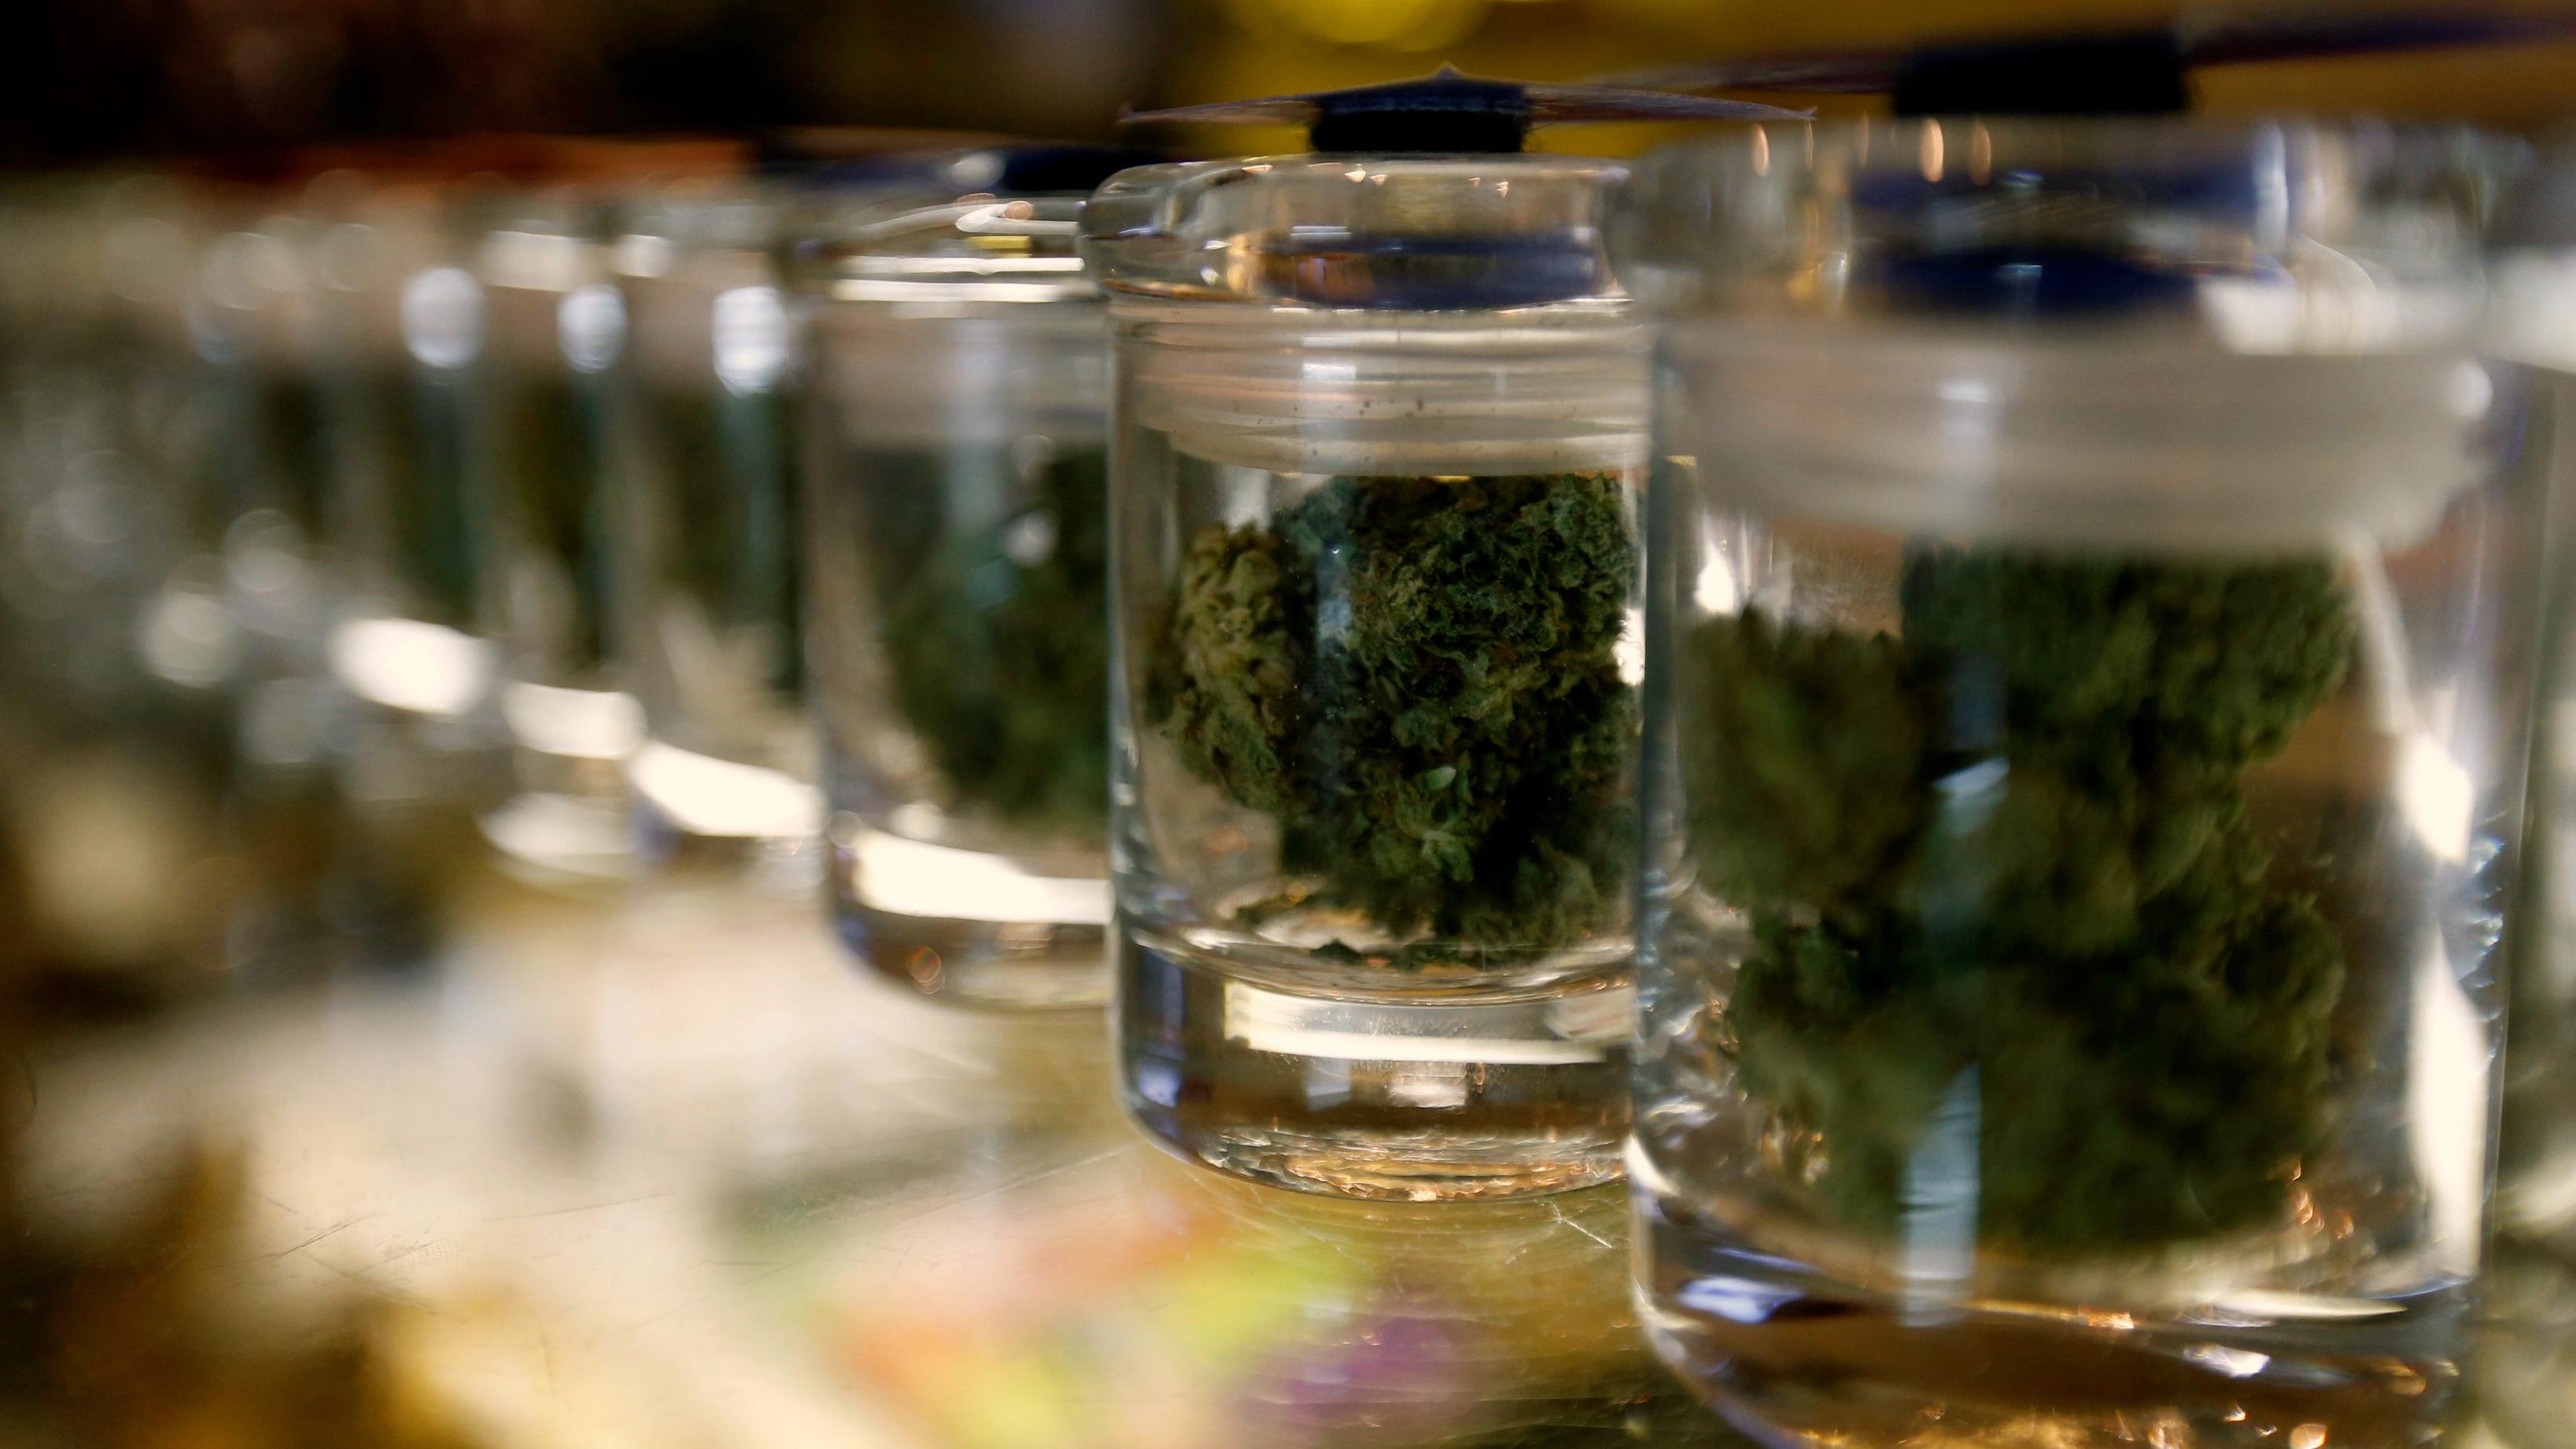 Medicinal marijuana buds in jars.